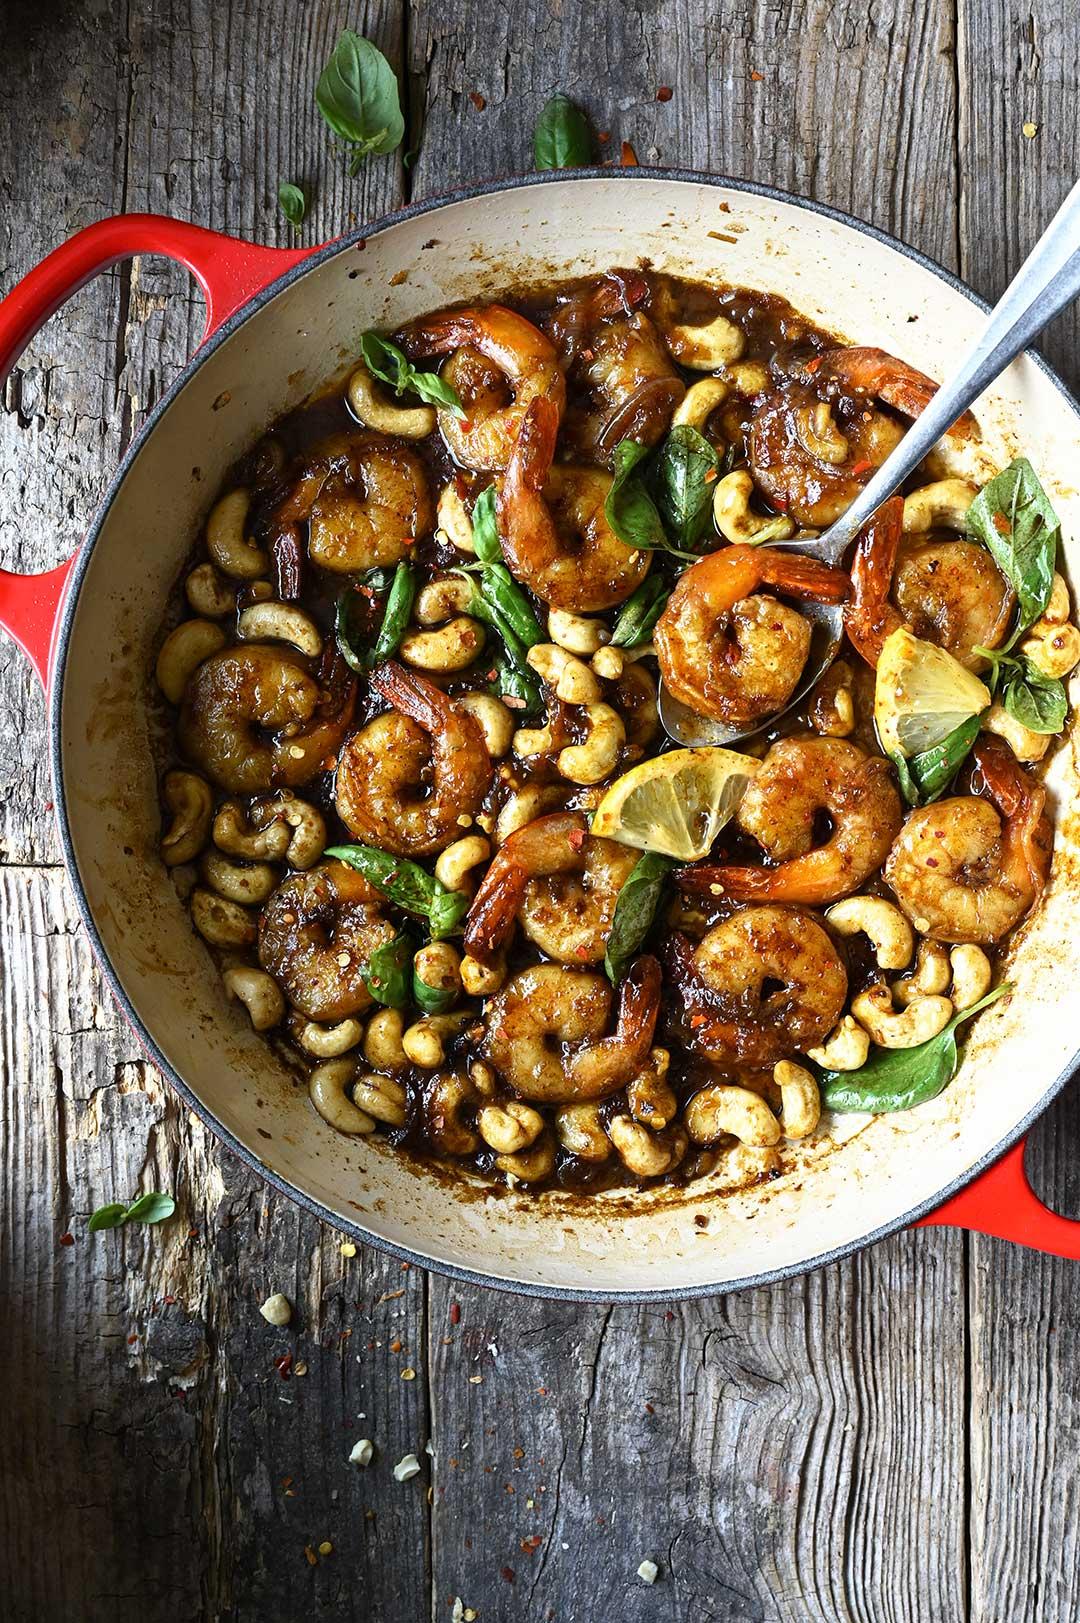 serving dumplings | 20 minute cashew shrimp with sticky garlic soy sauce